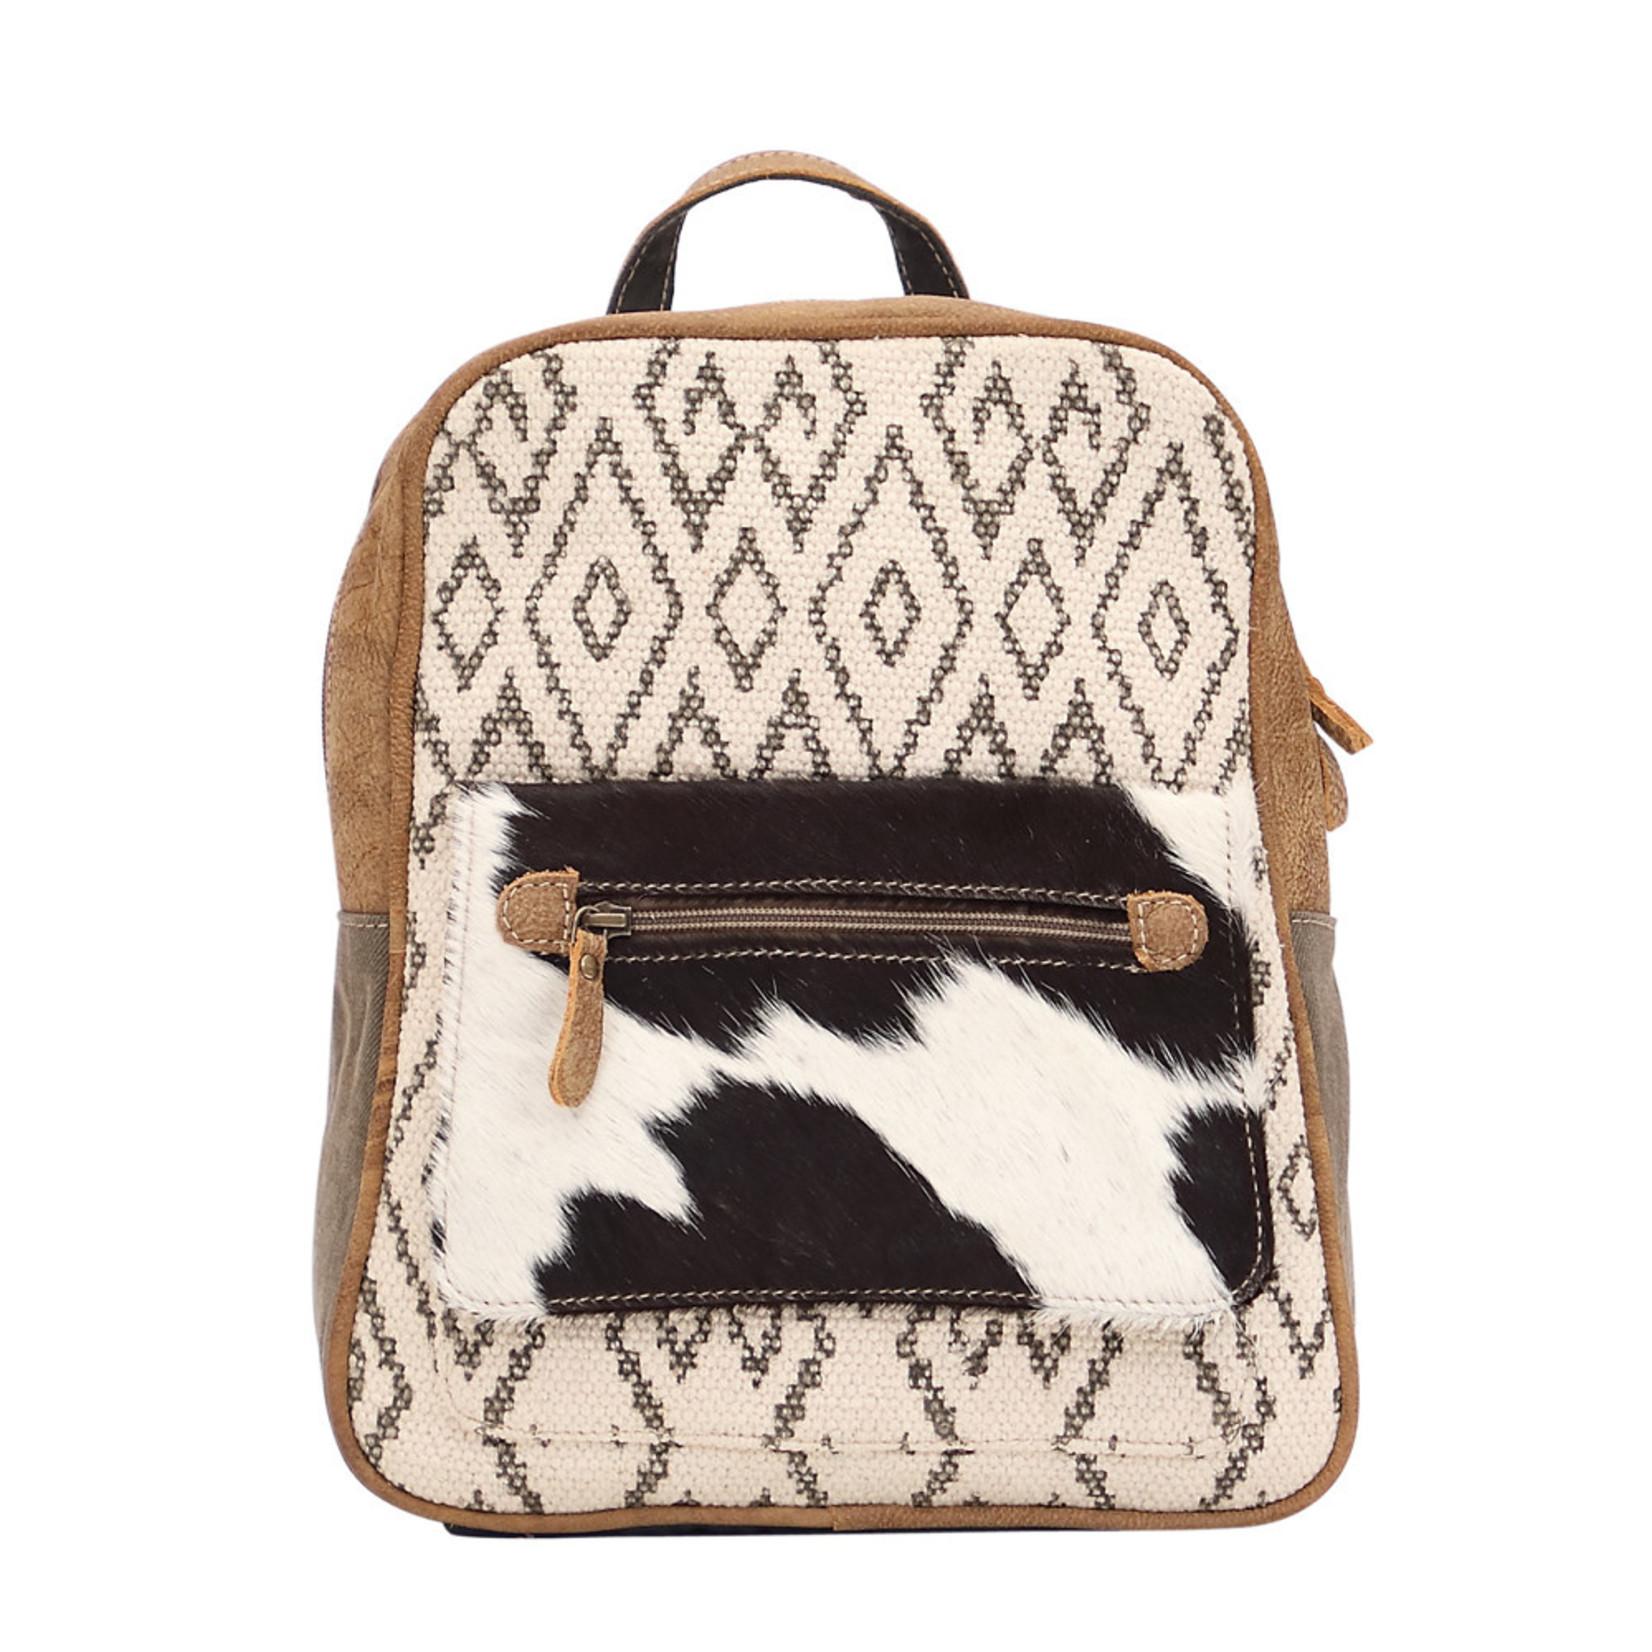 Myra Bags S-1520 Chevron Backpack Bag